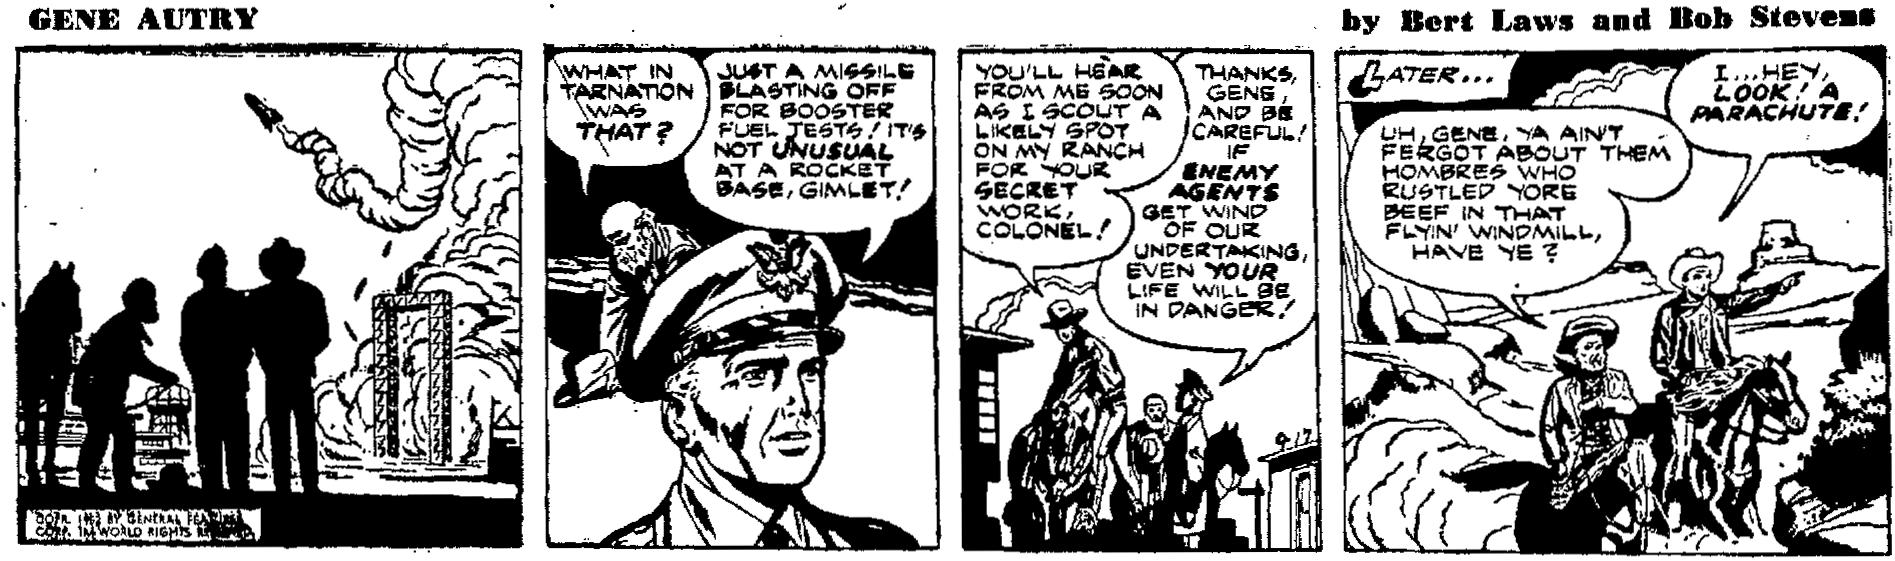 Gene Autry 19520017 (Madison Capital Times)